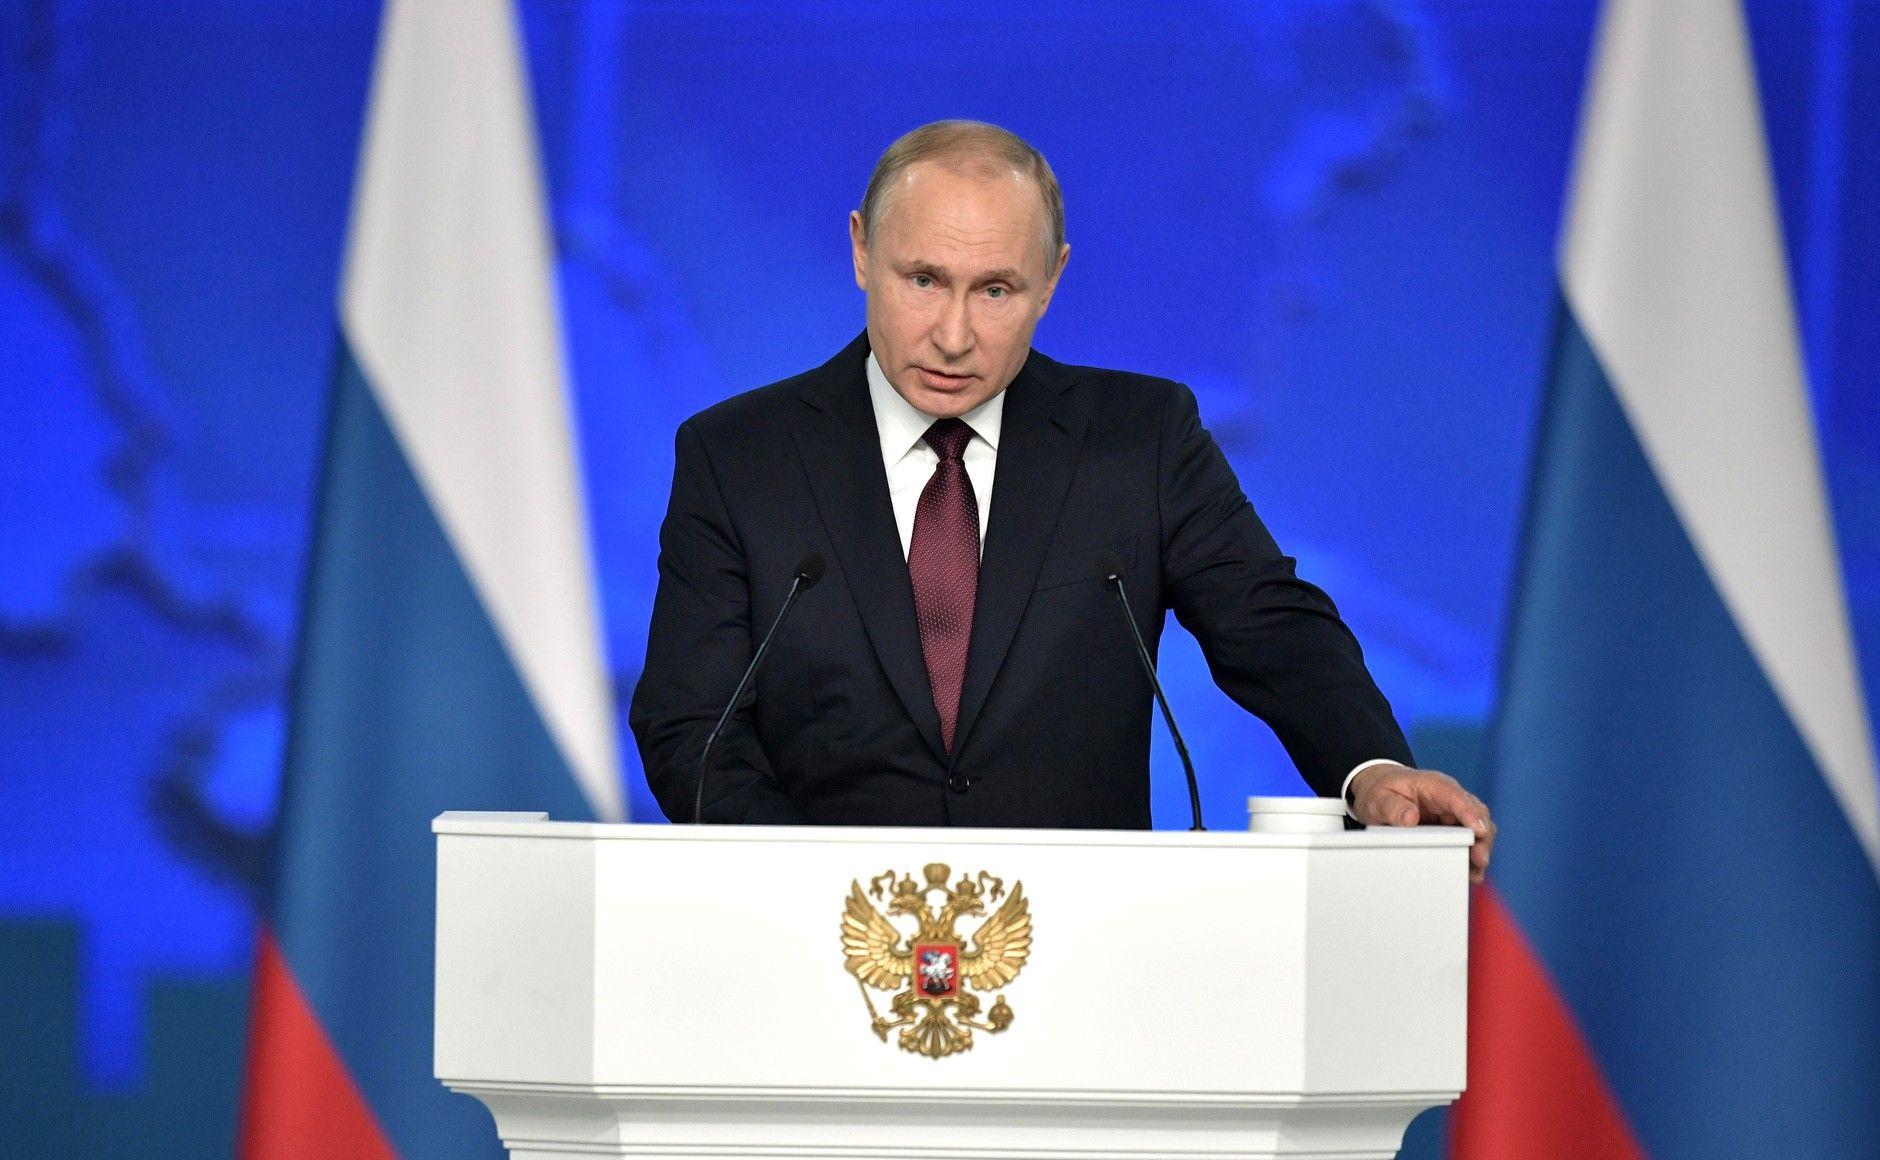 PutinStateNationAddress2019